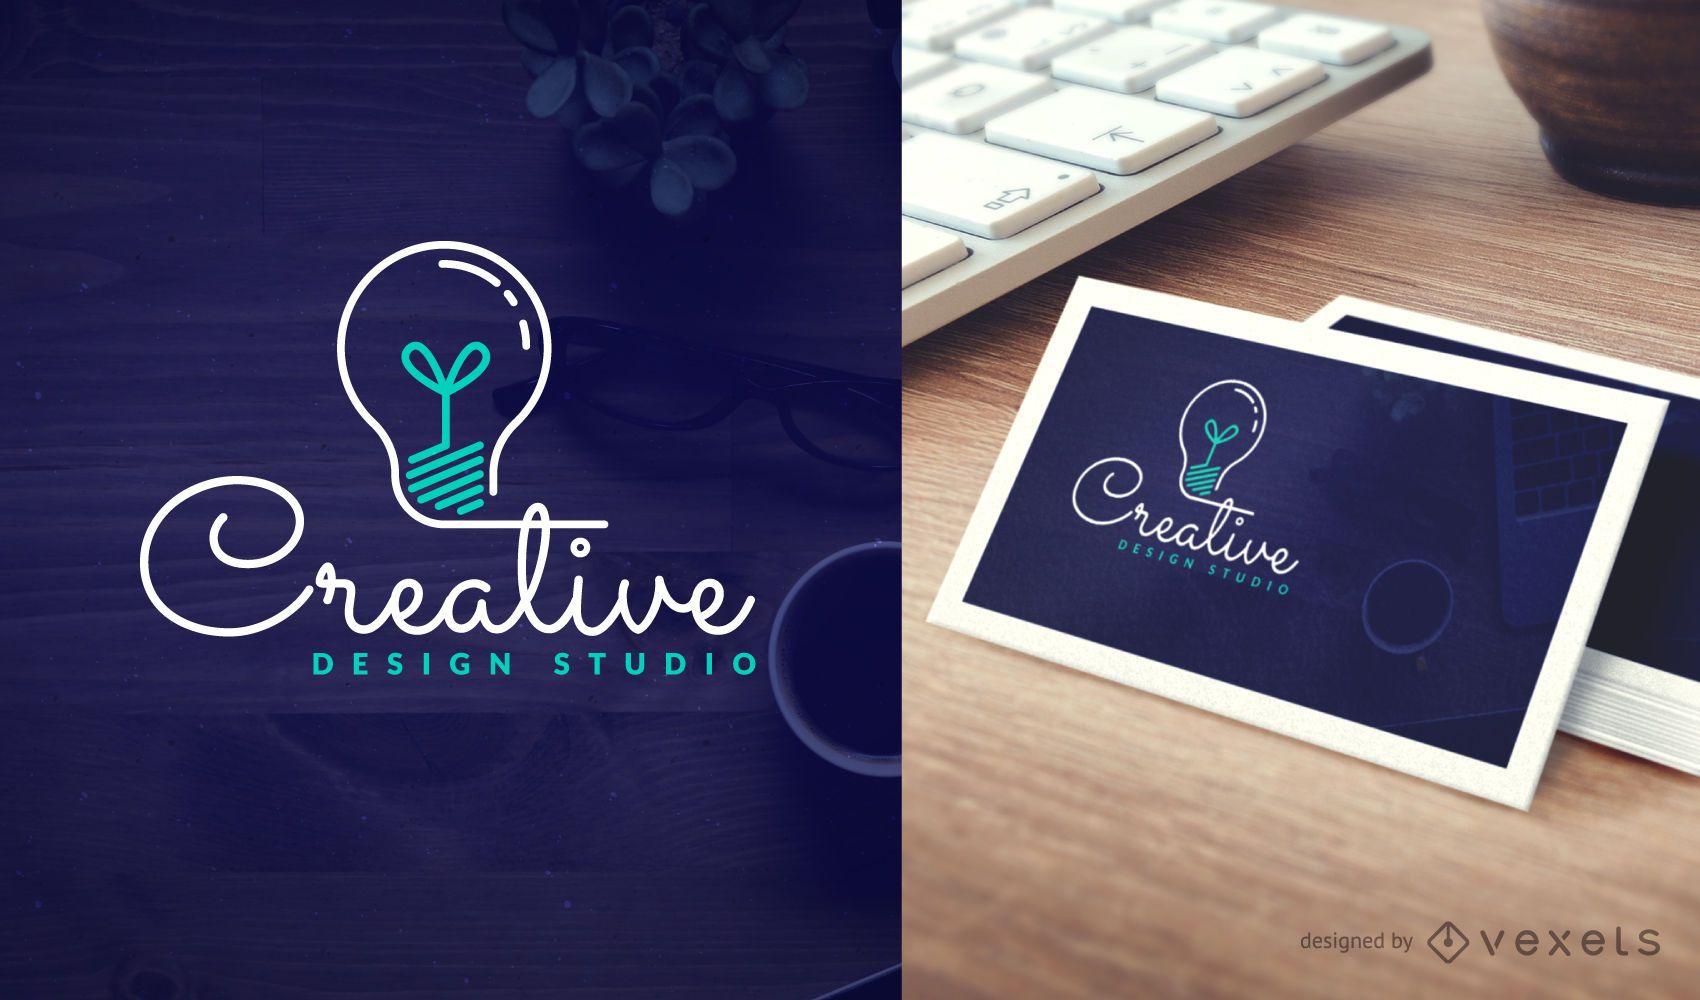 Logo-Vorlage des kreativen Designstudios